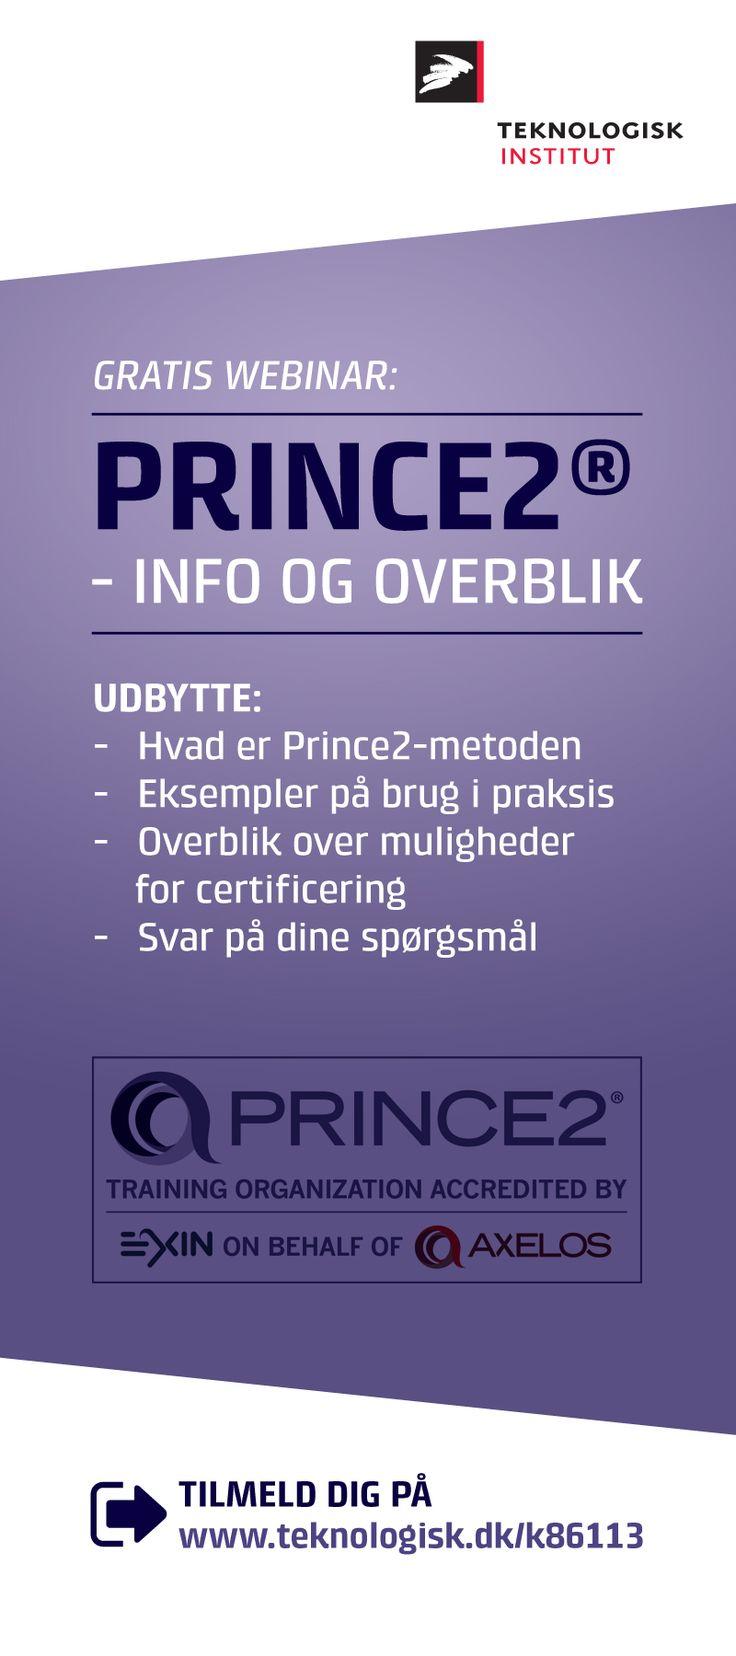 Få viden om PRICE2-metoden med dette gratis webinar.